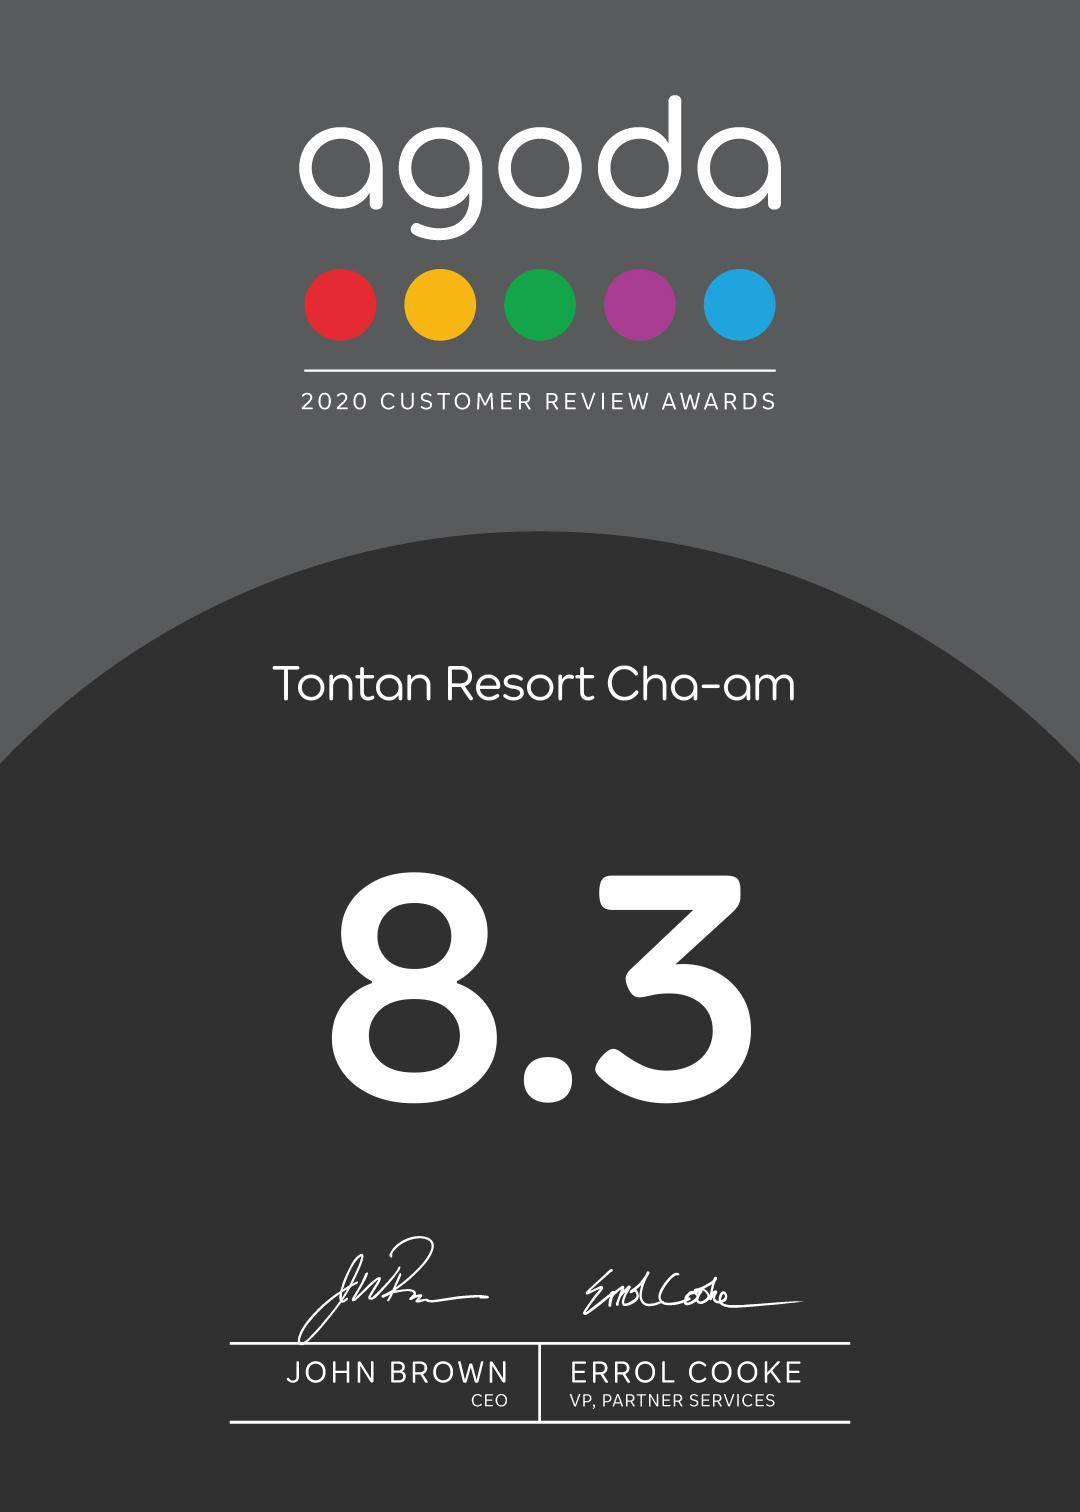 Tontan Resort Cha-am - Agoda customer review awards 2020